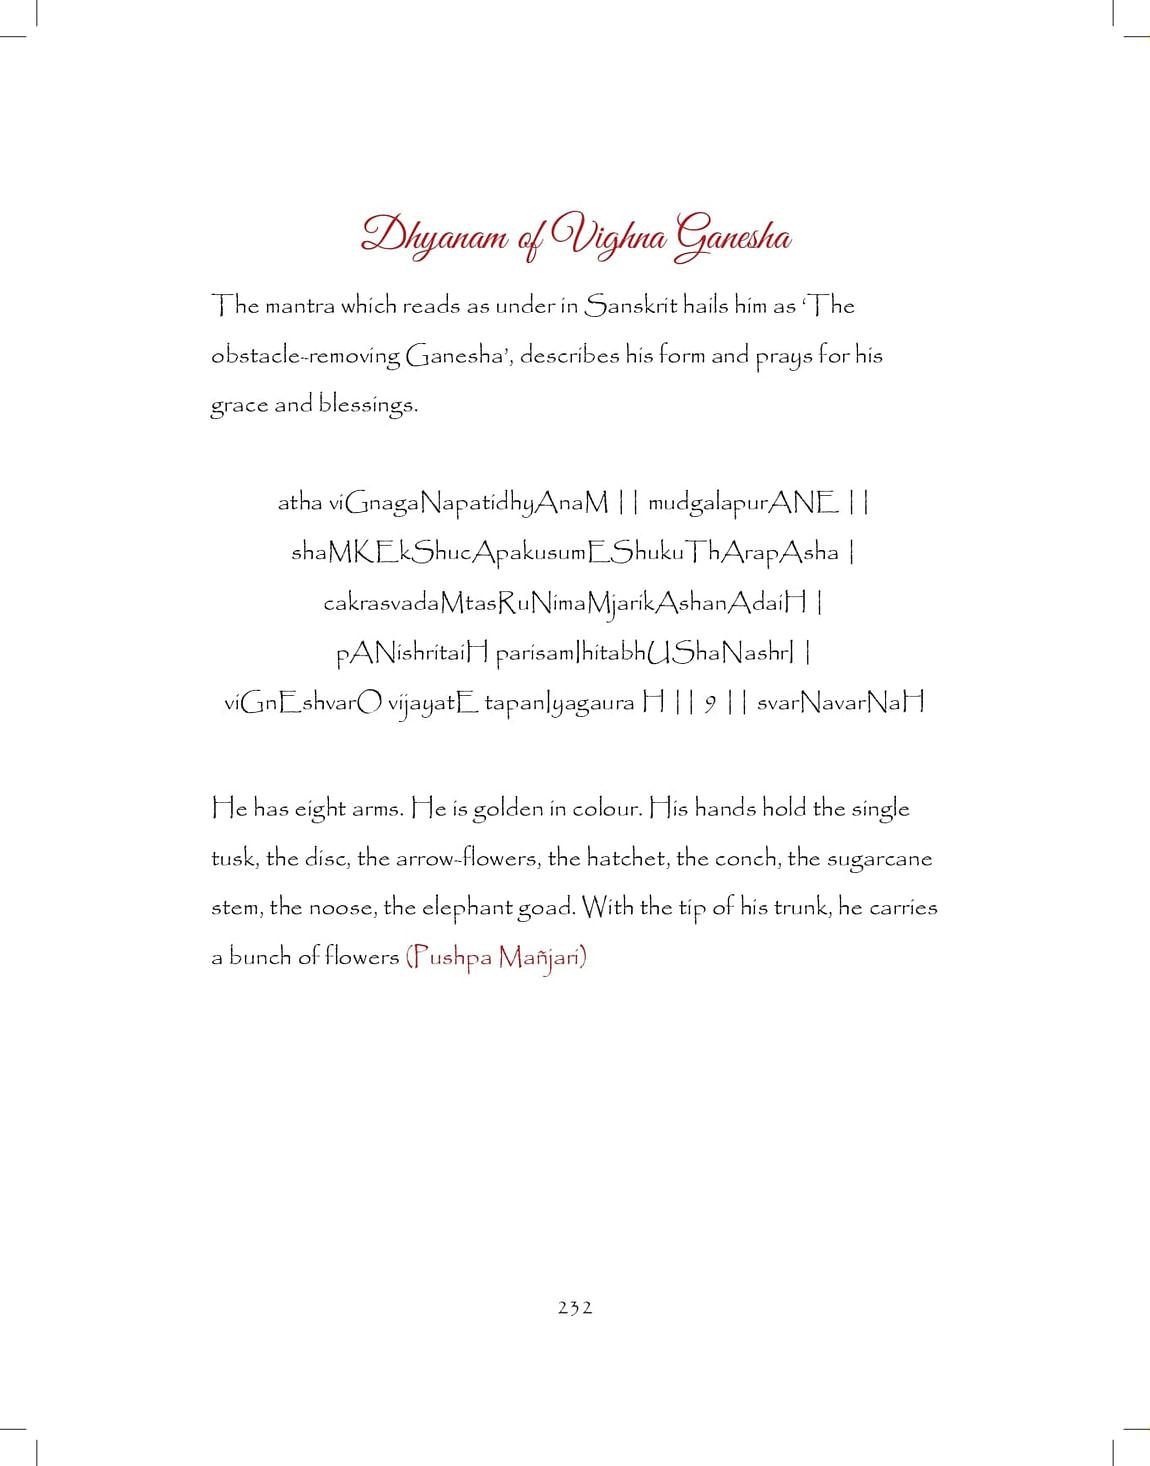 Ganesh-print_pages-to-jpg-0232.jpg